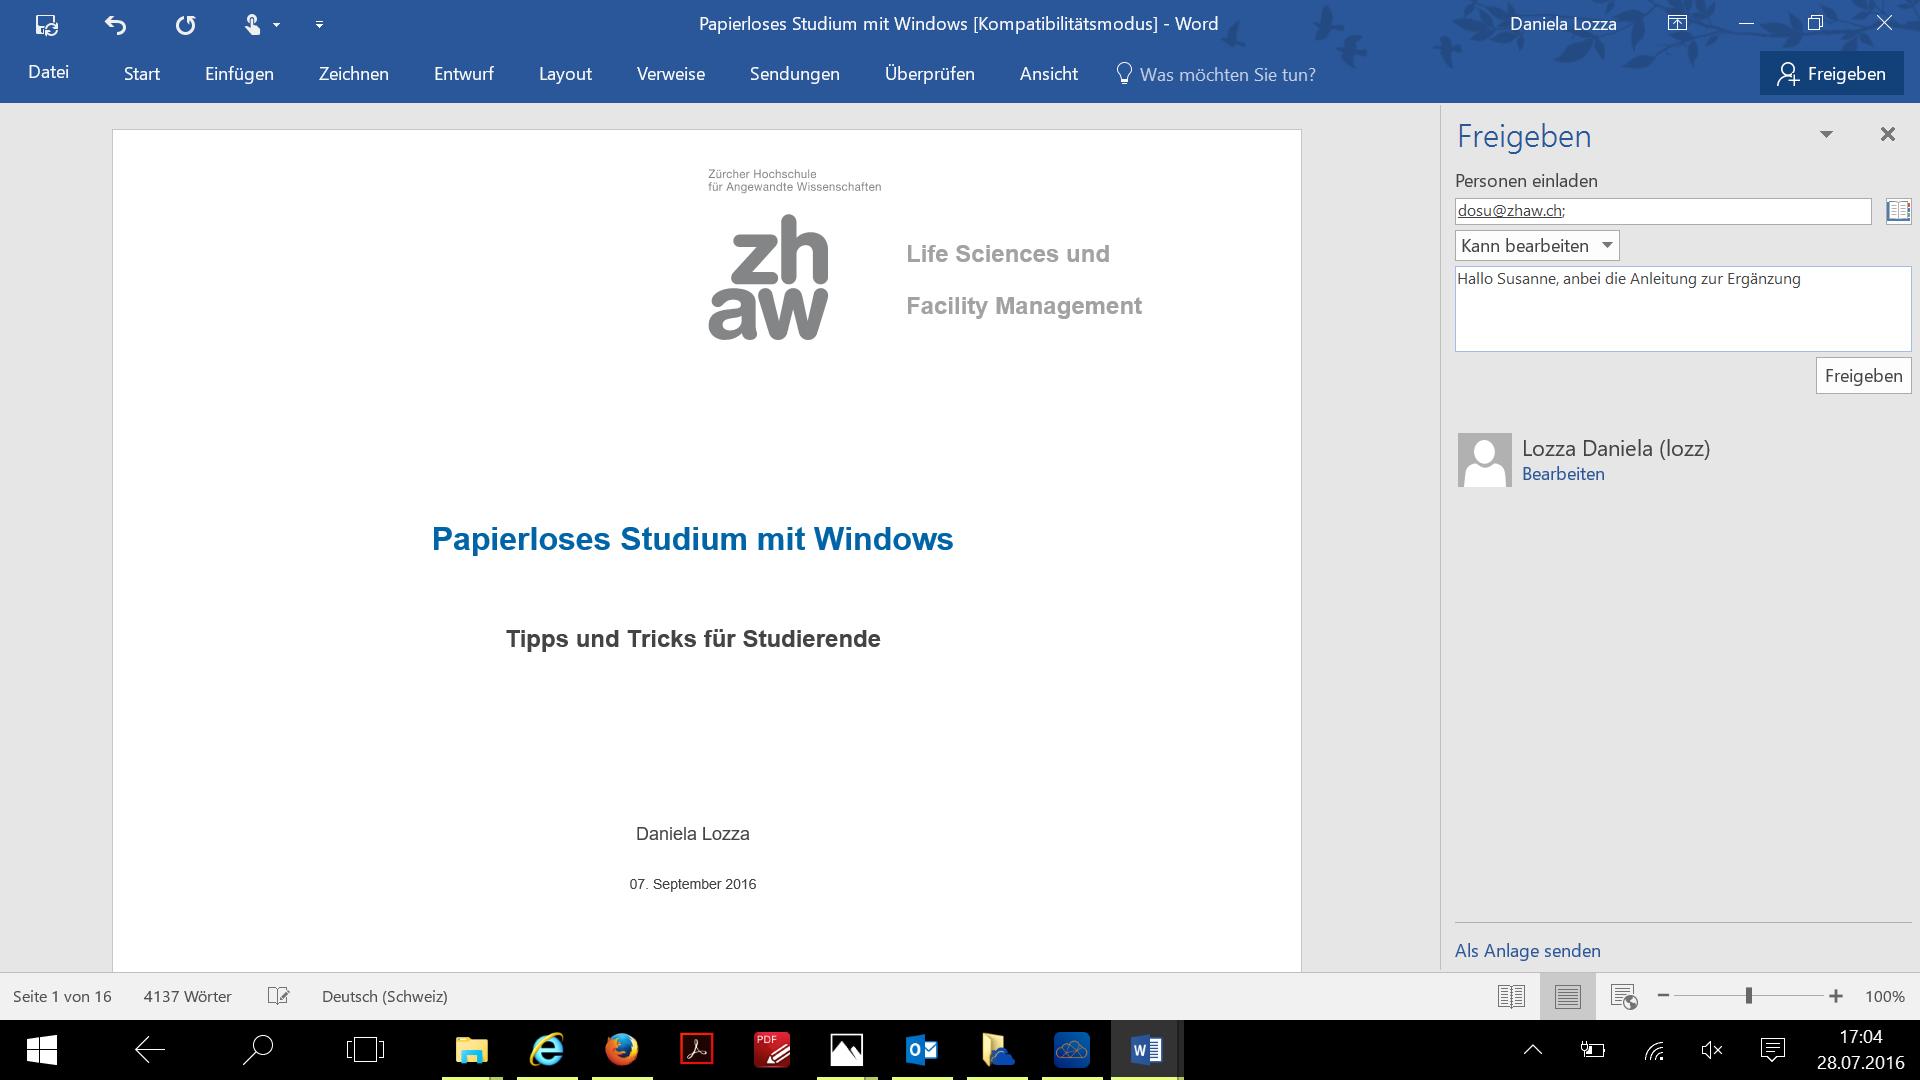 OneDrive Datei in Word freigeben